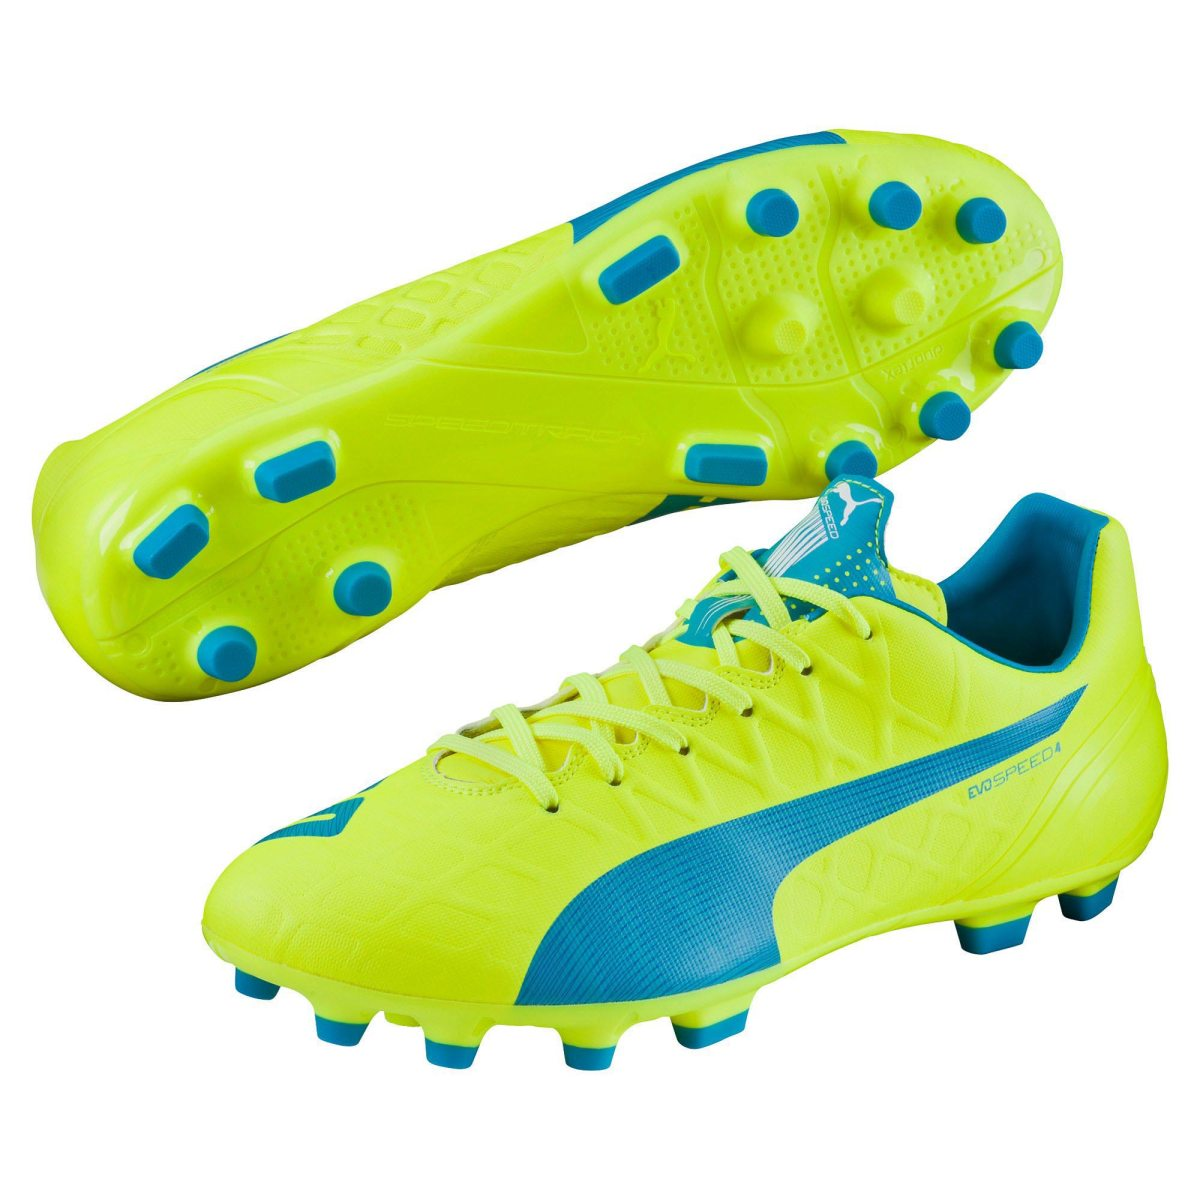 premium selection 0a273 a8555 puma evospeed 4.4 ag q1 16 fotbollssko senior fotbollsskor